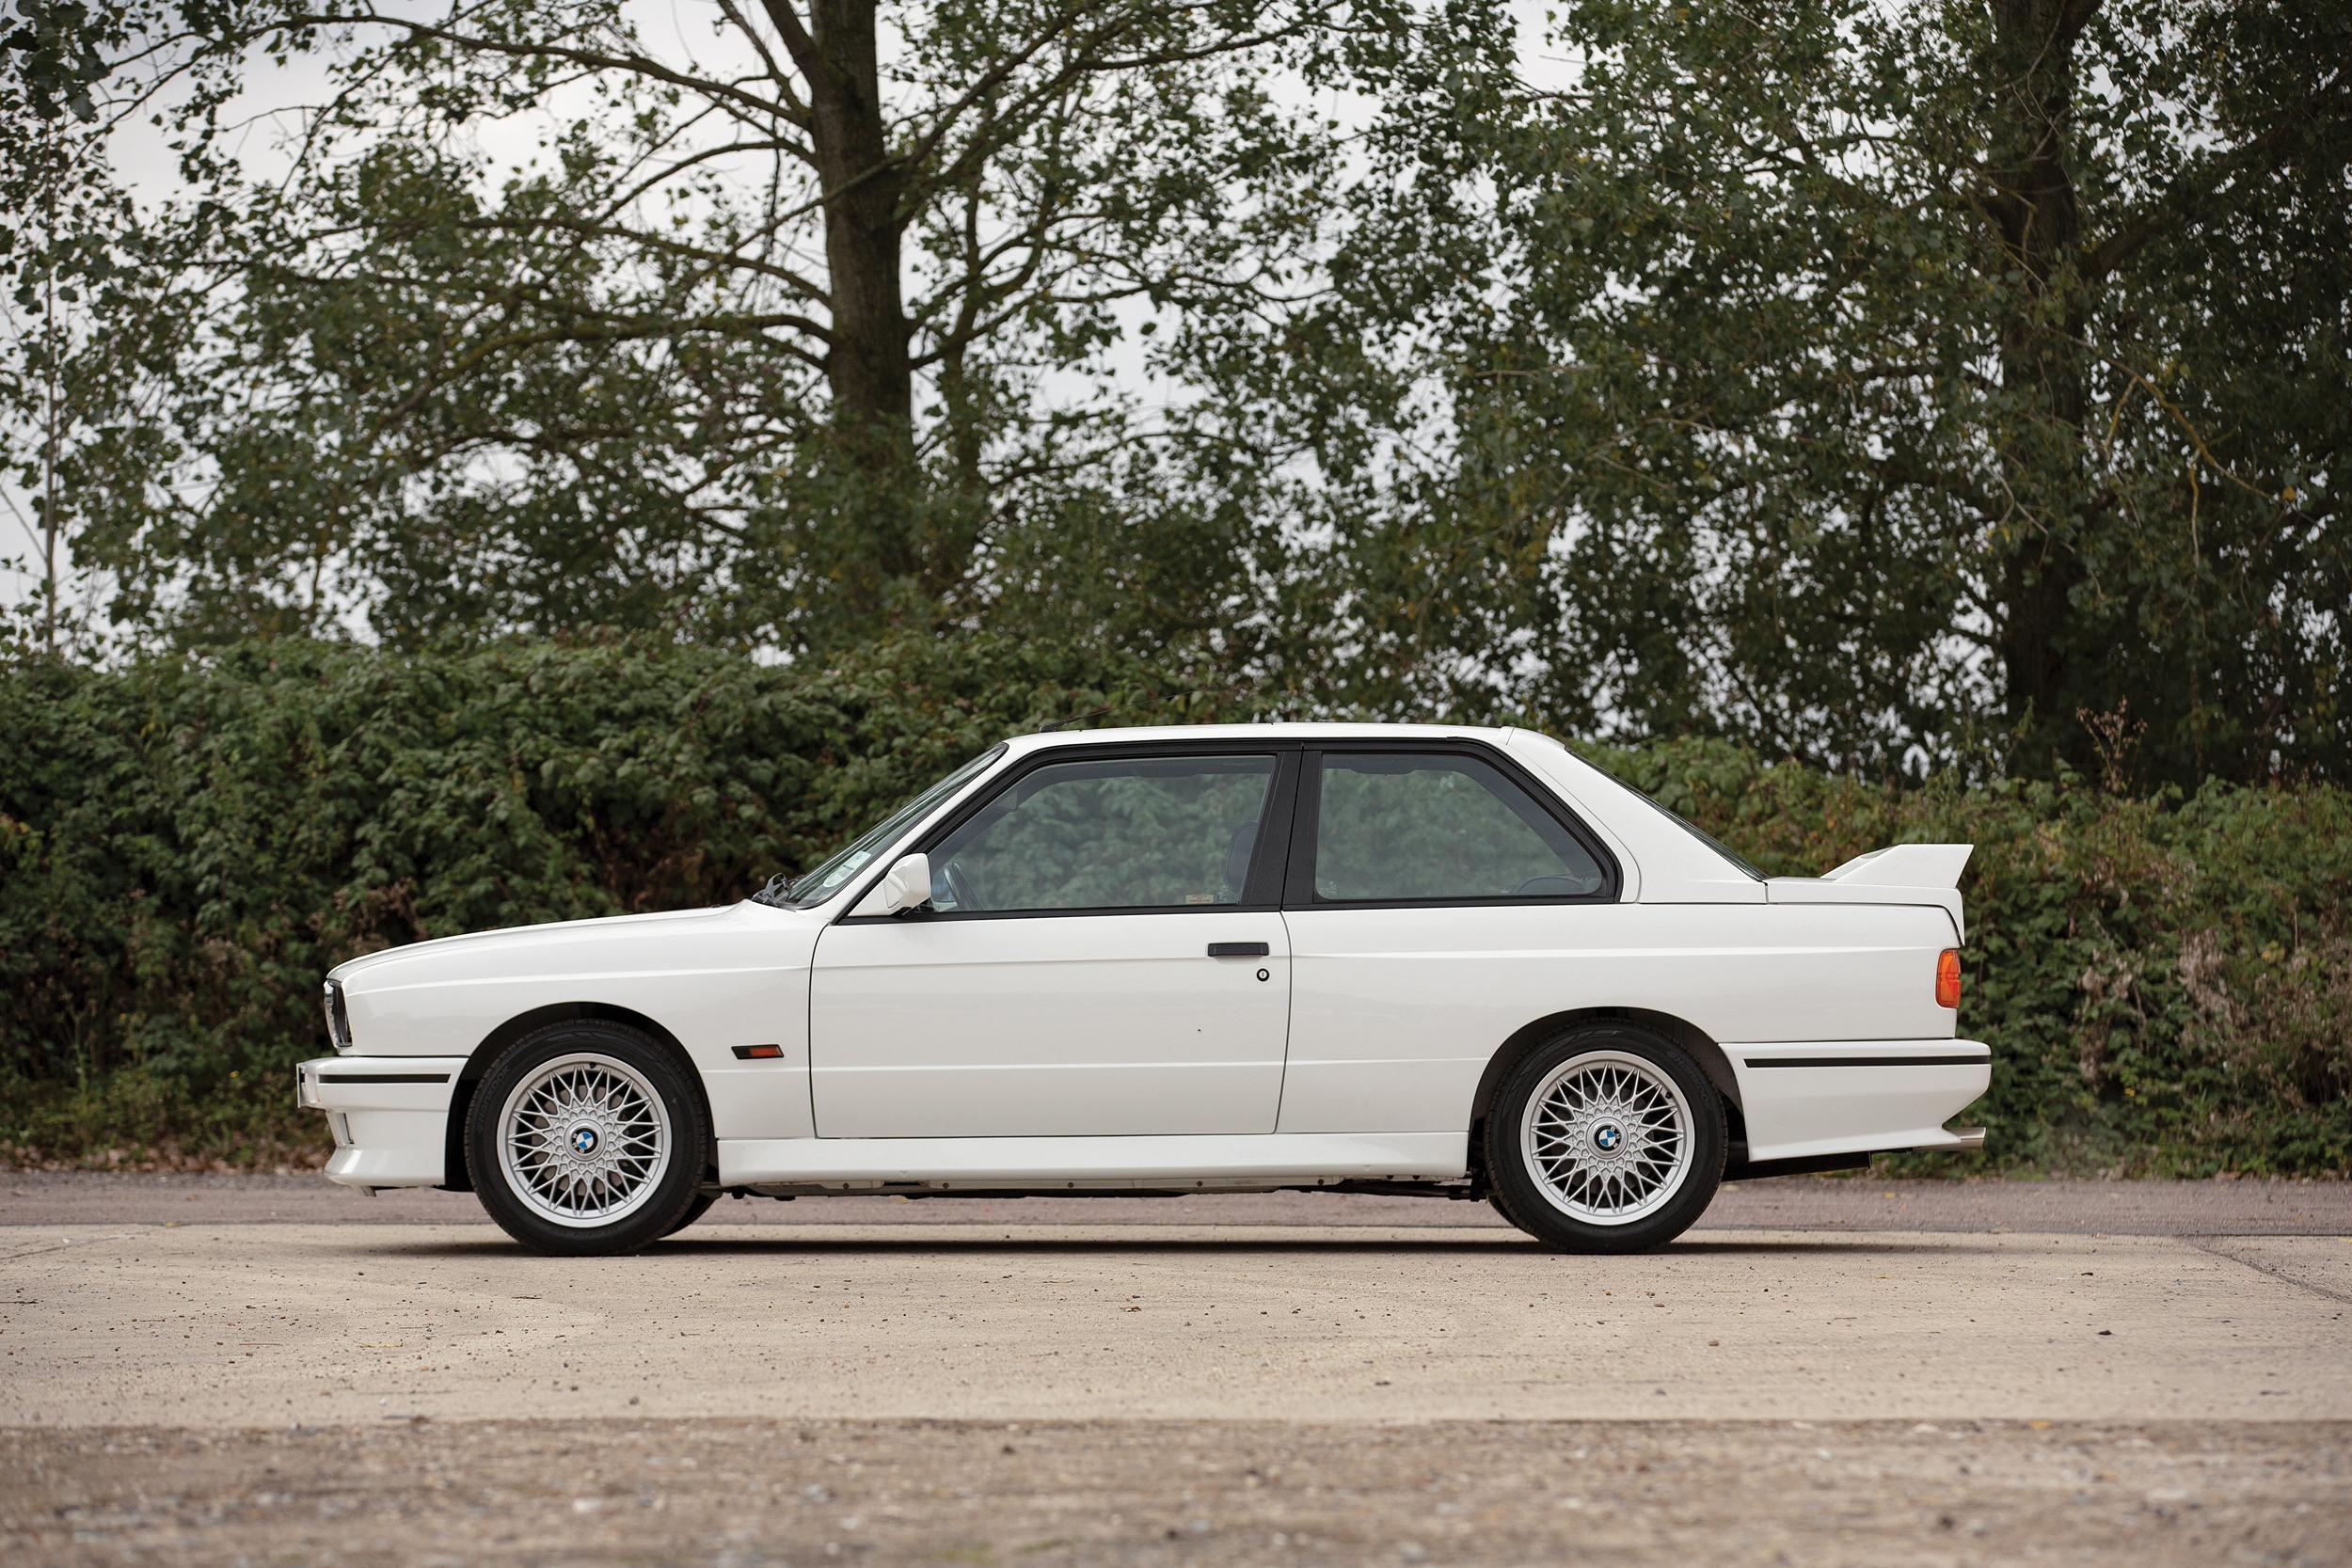 190928 1991 BMW M3 - RM Sotheby's London Sale